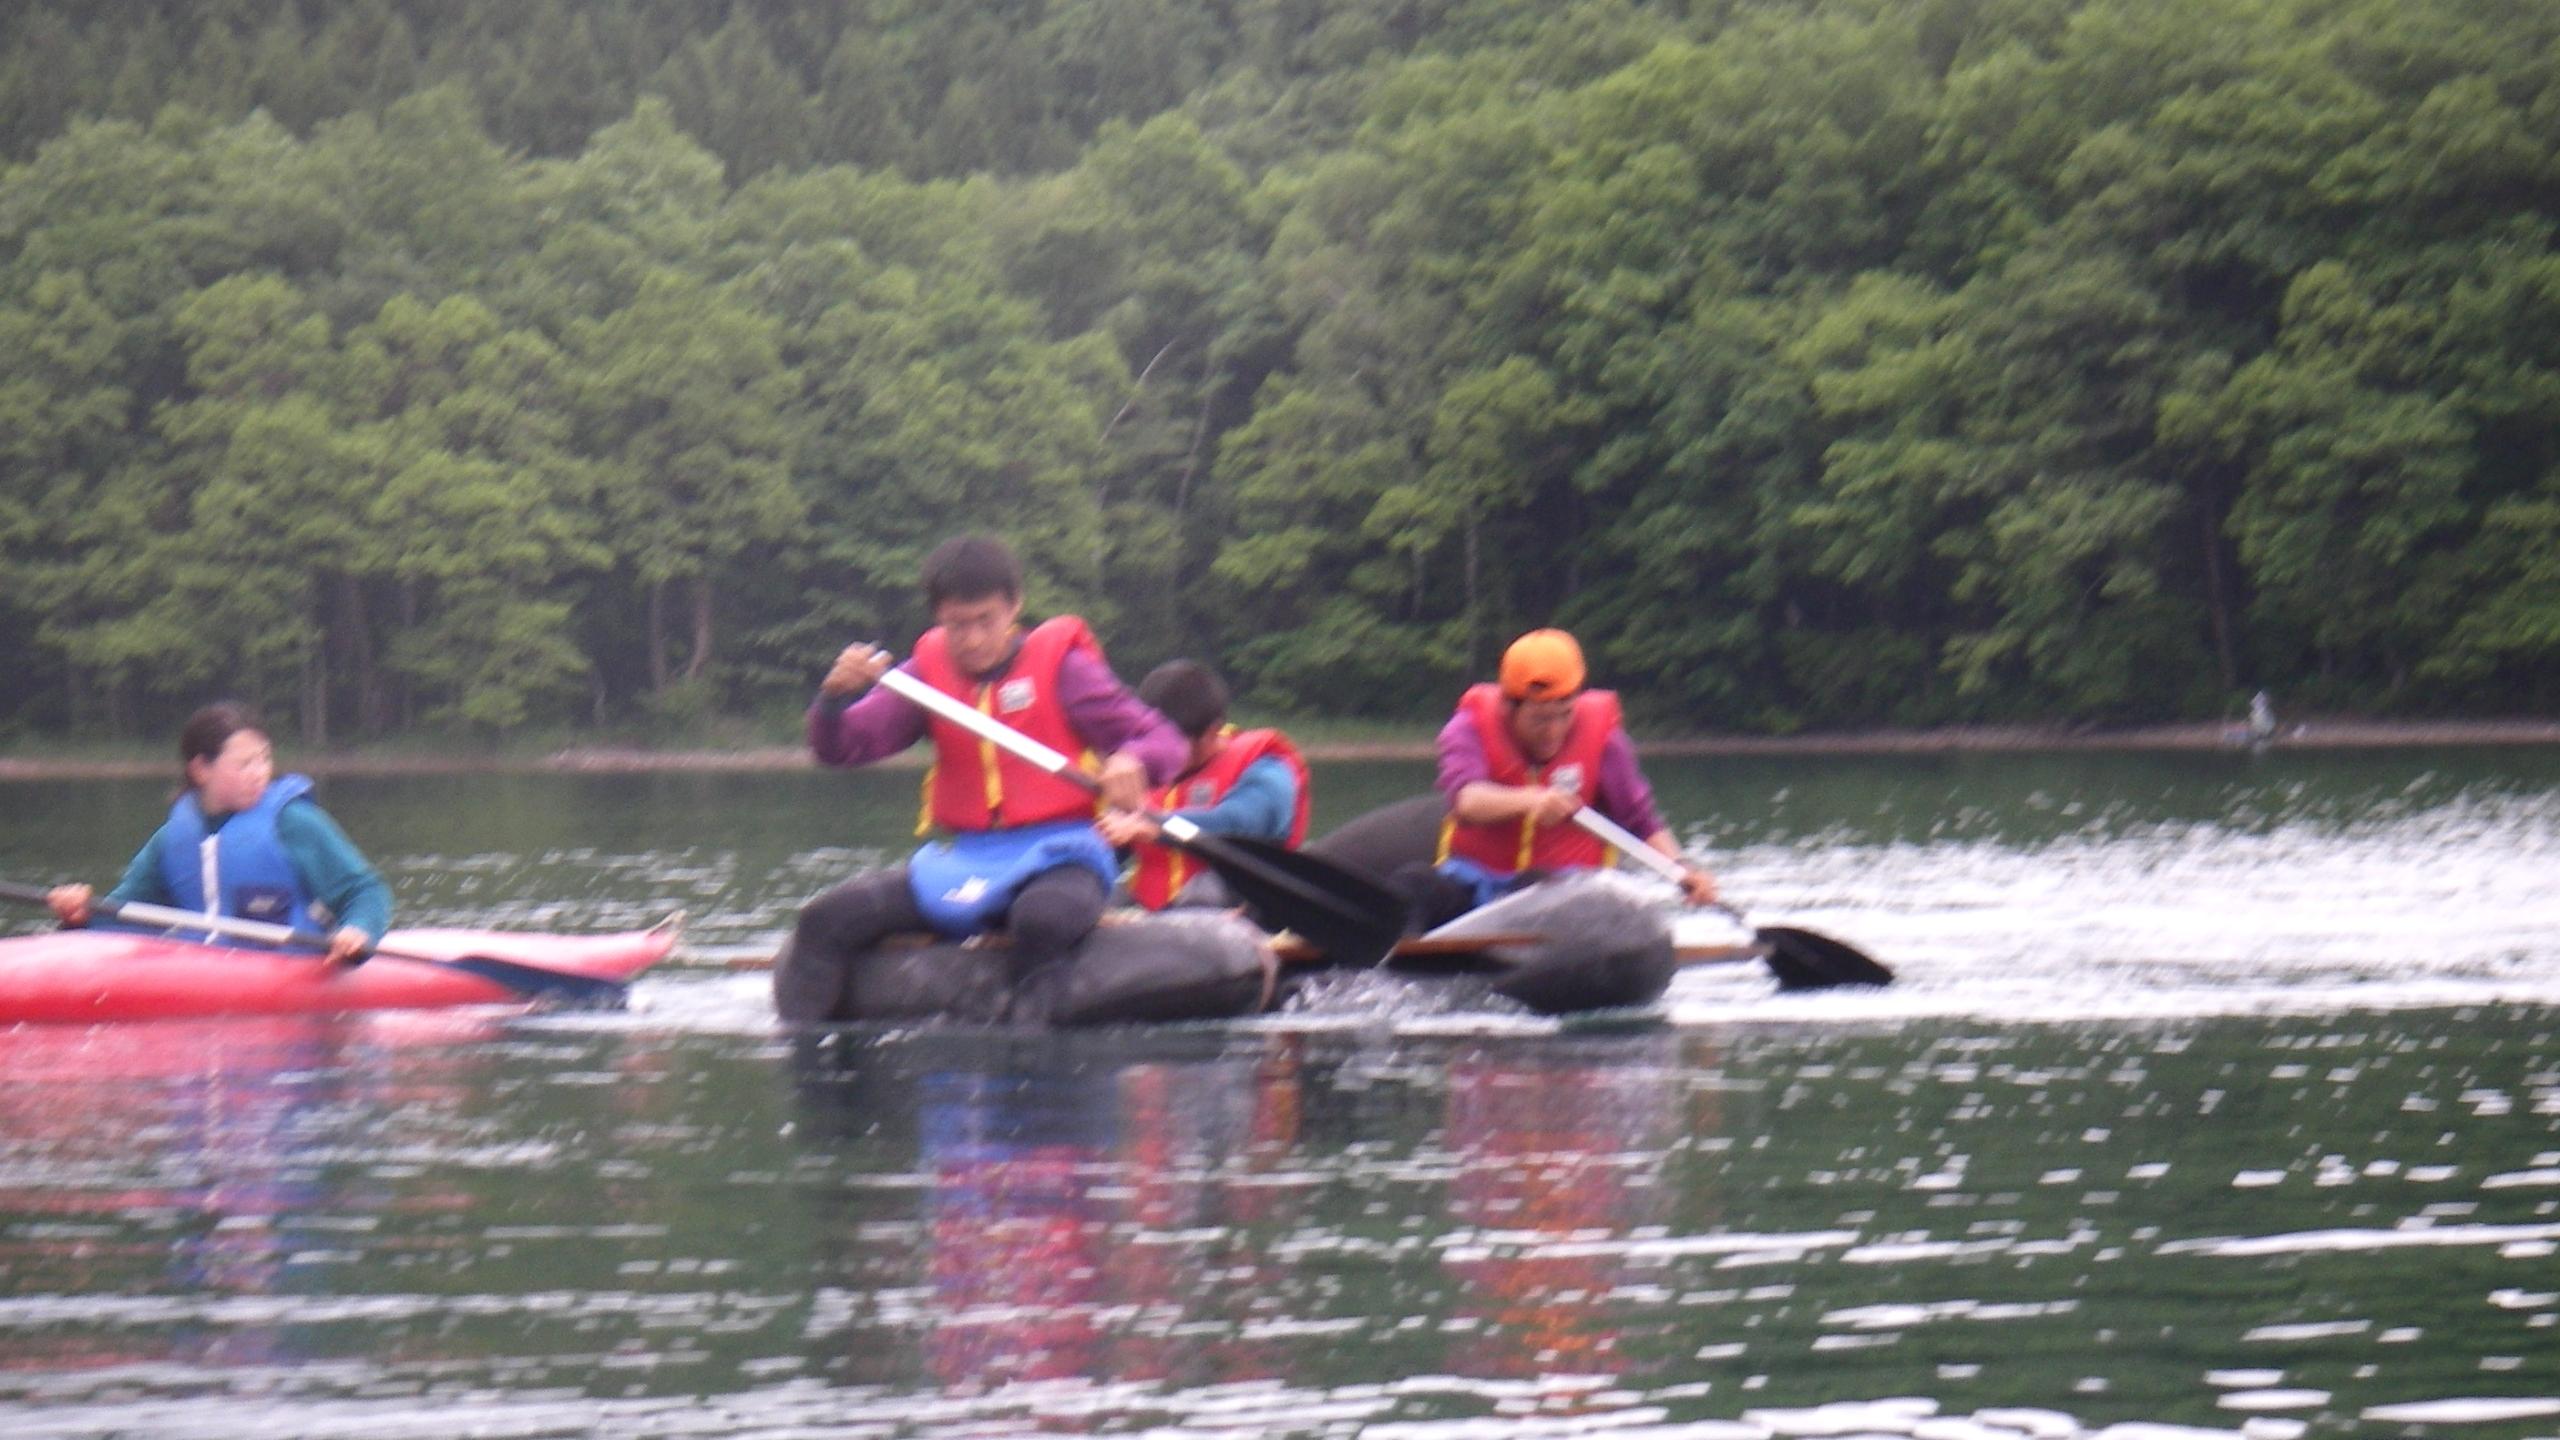 OBS-JALT2006-44日目:青木湖にて、手作りいかだで湖上レース!